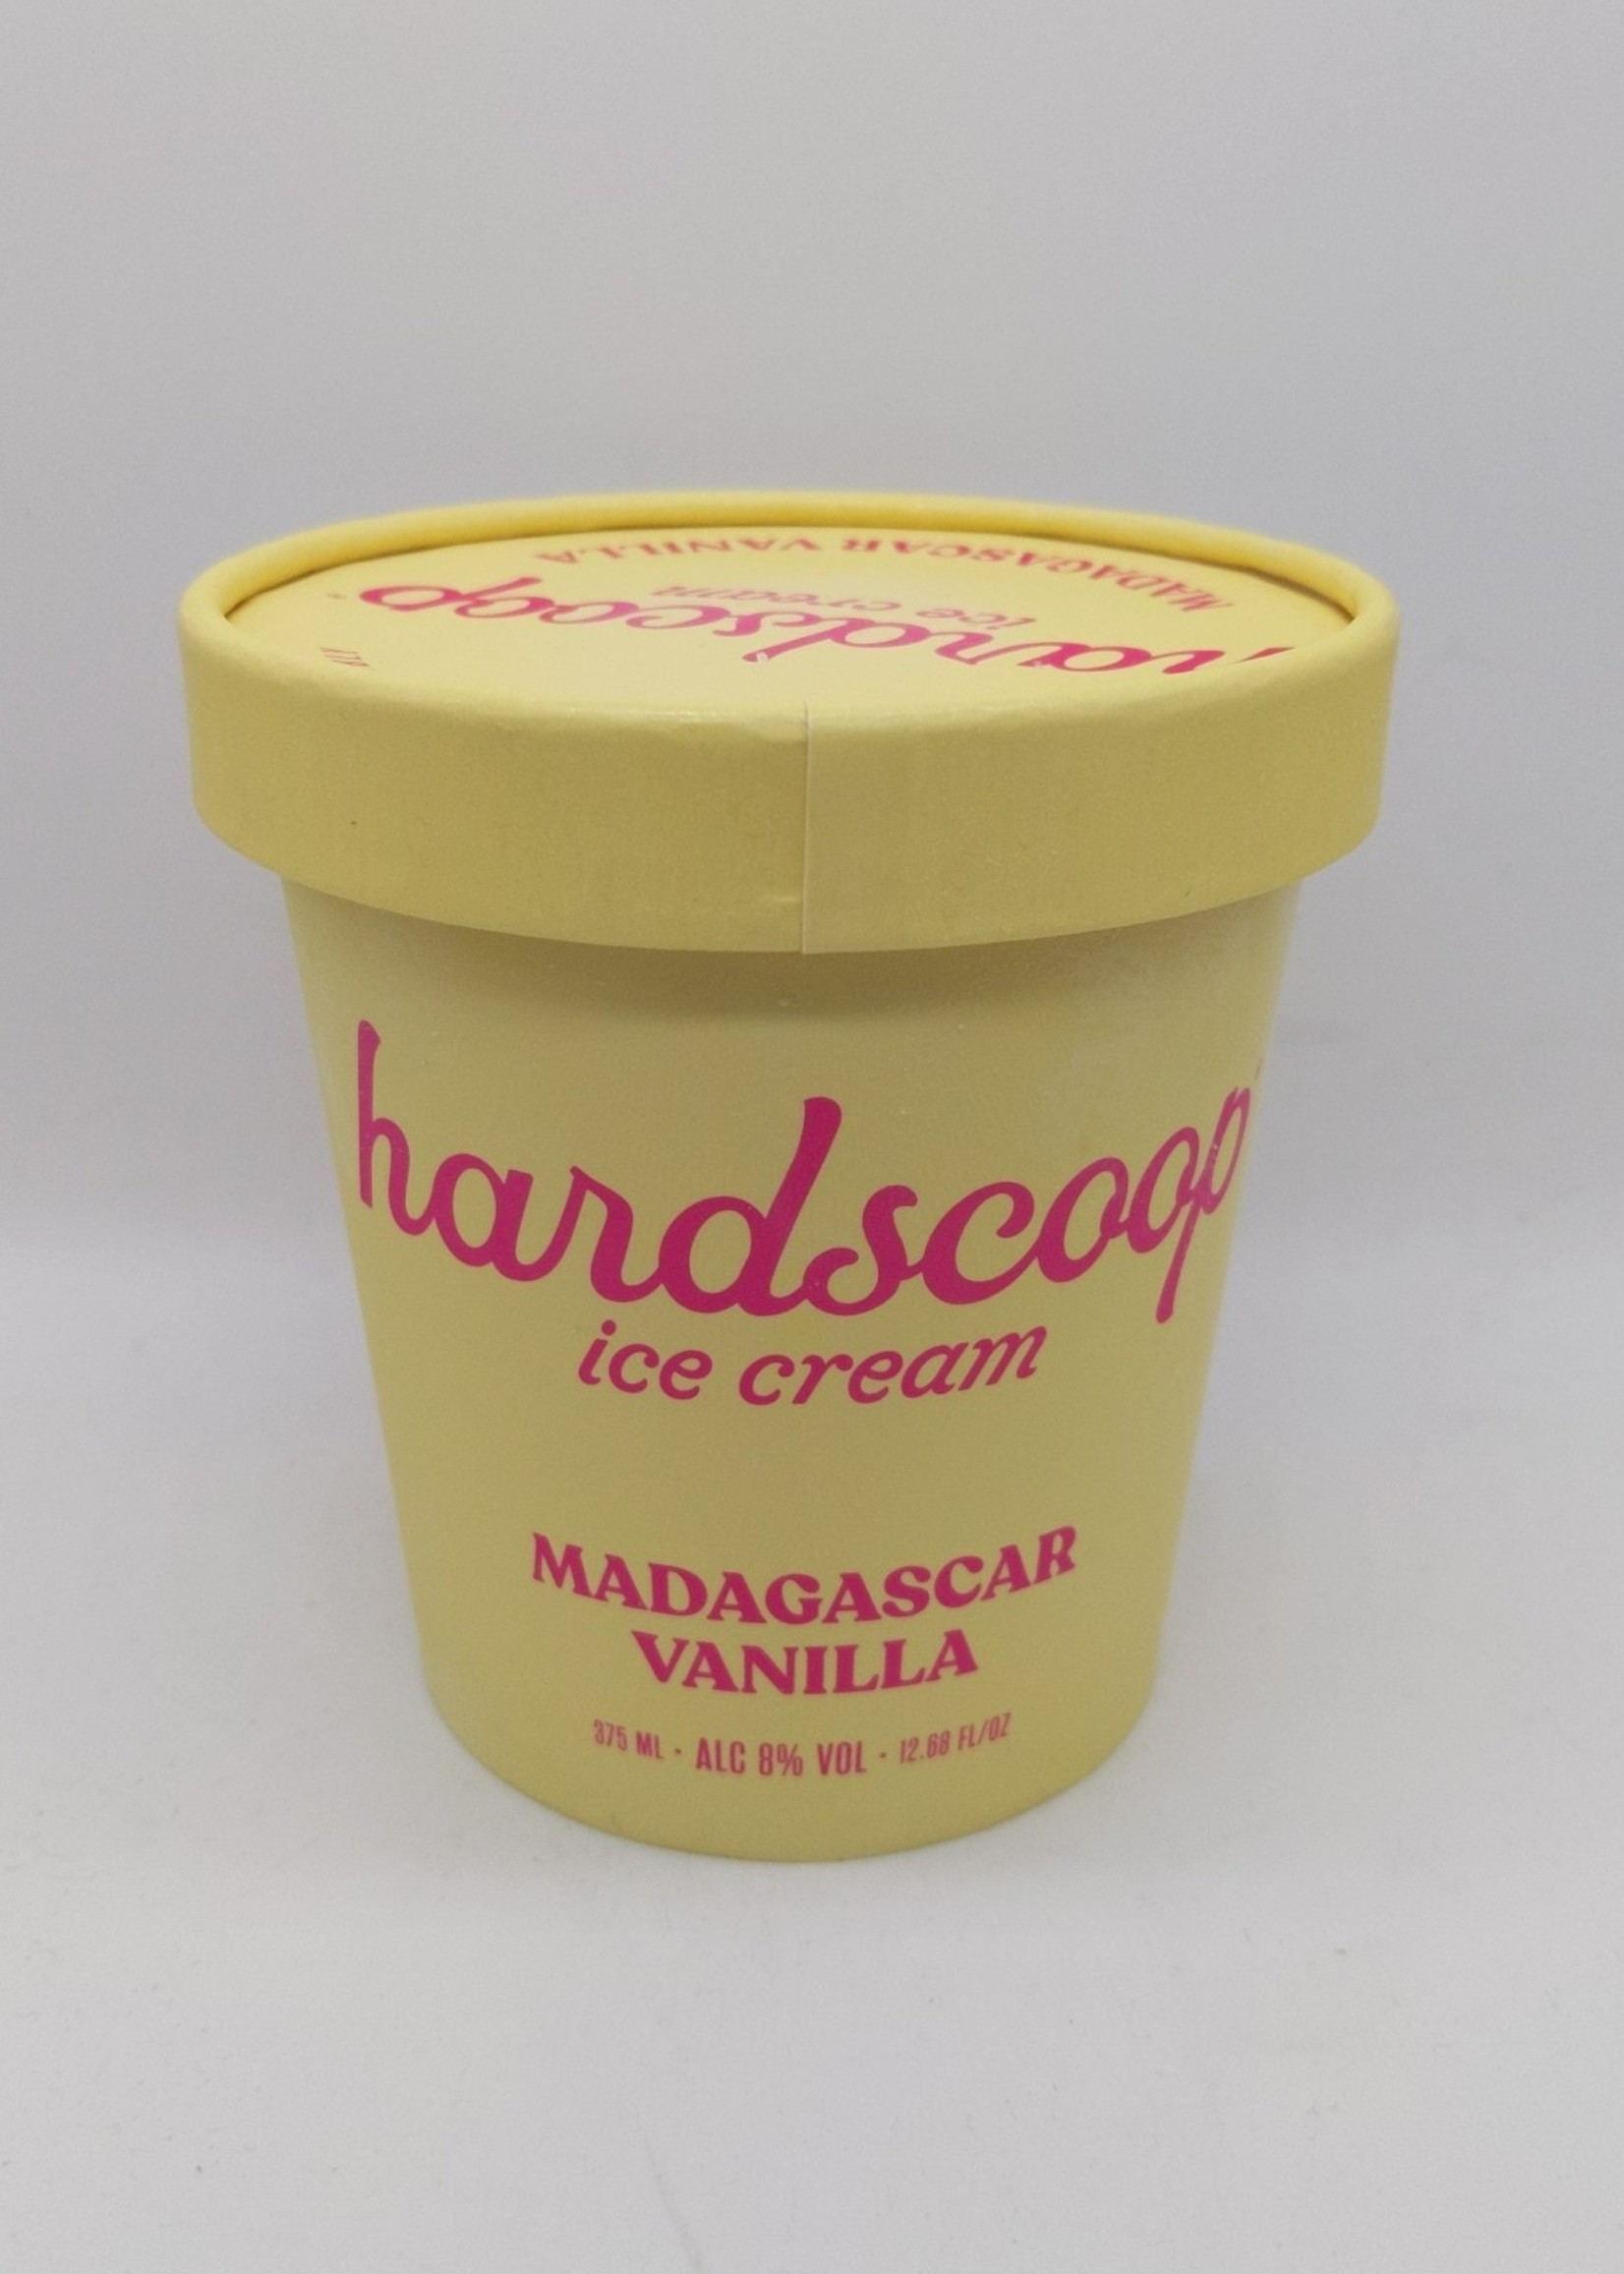 HARDSCOOP VANILLA ICE CREAM